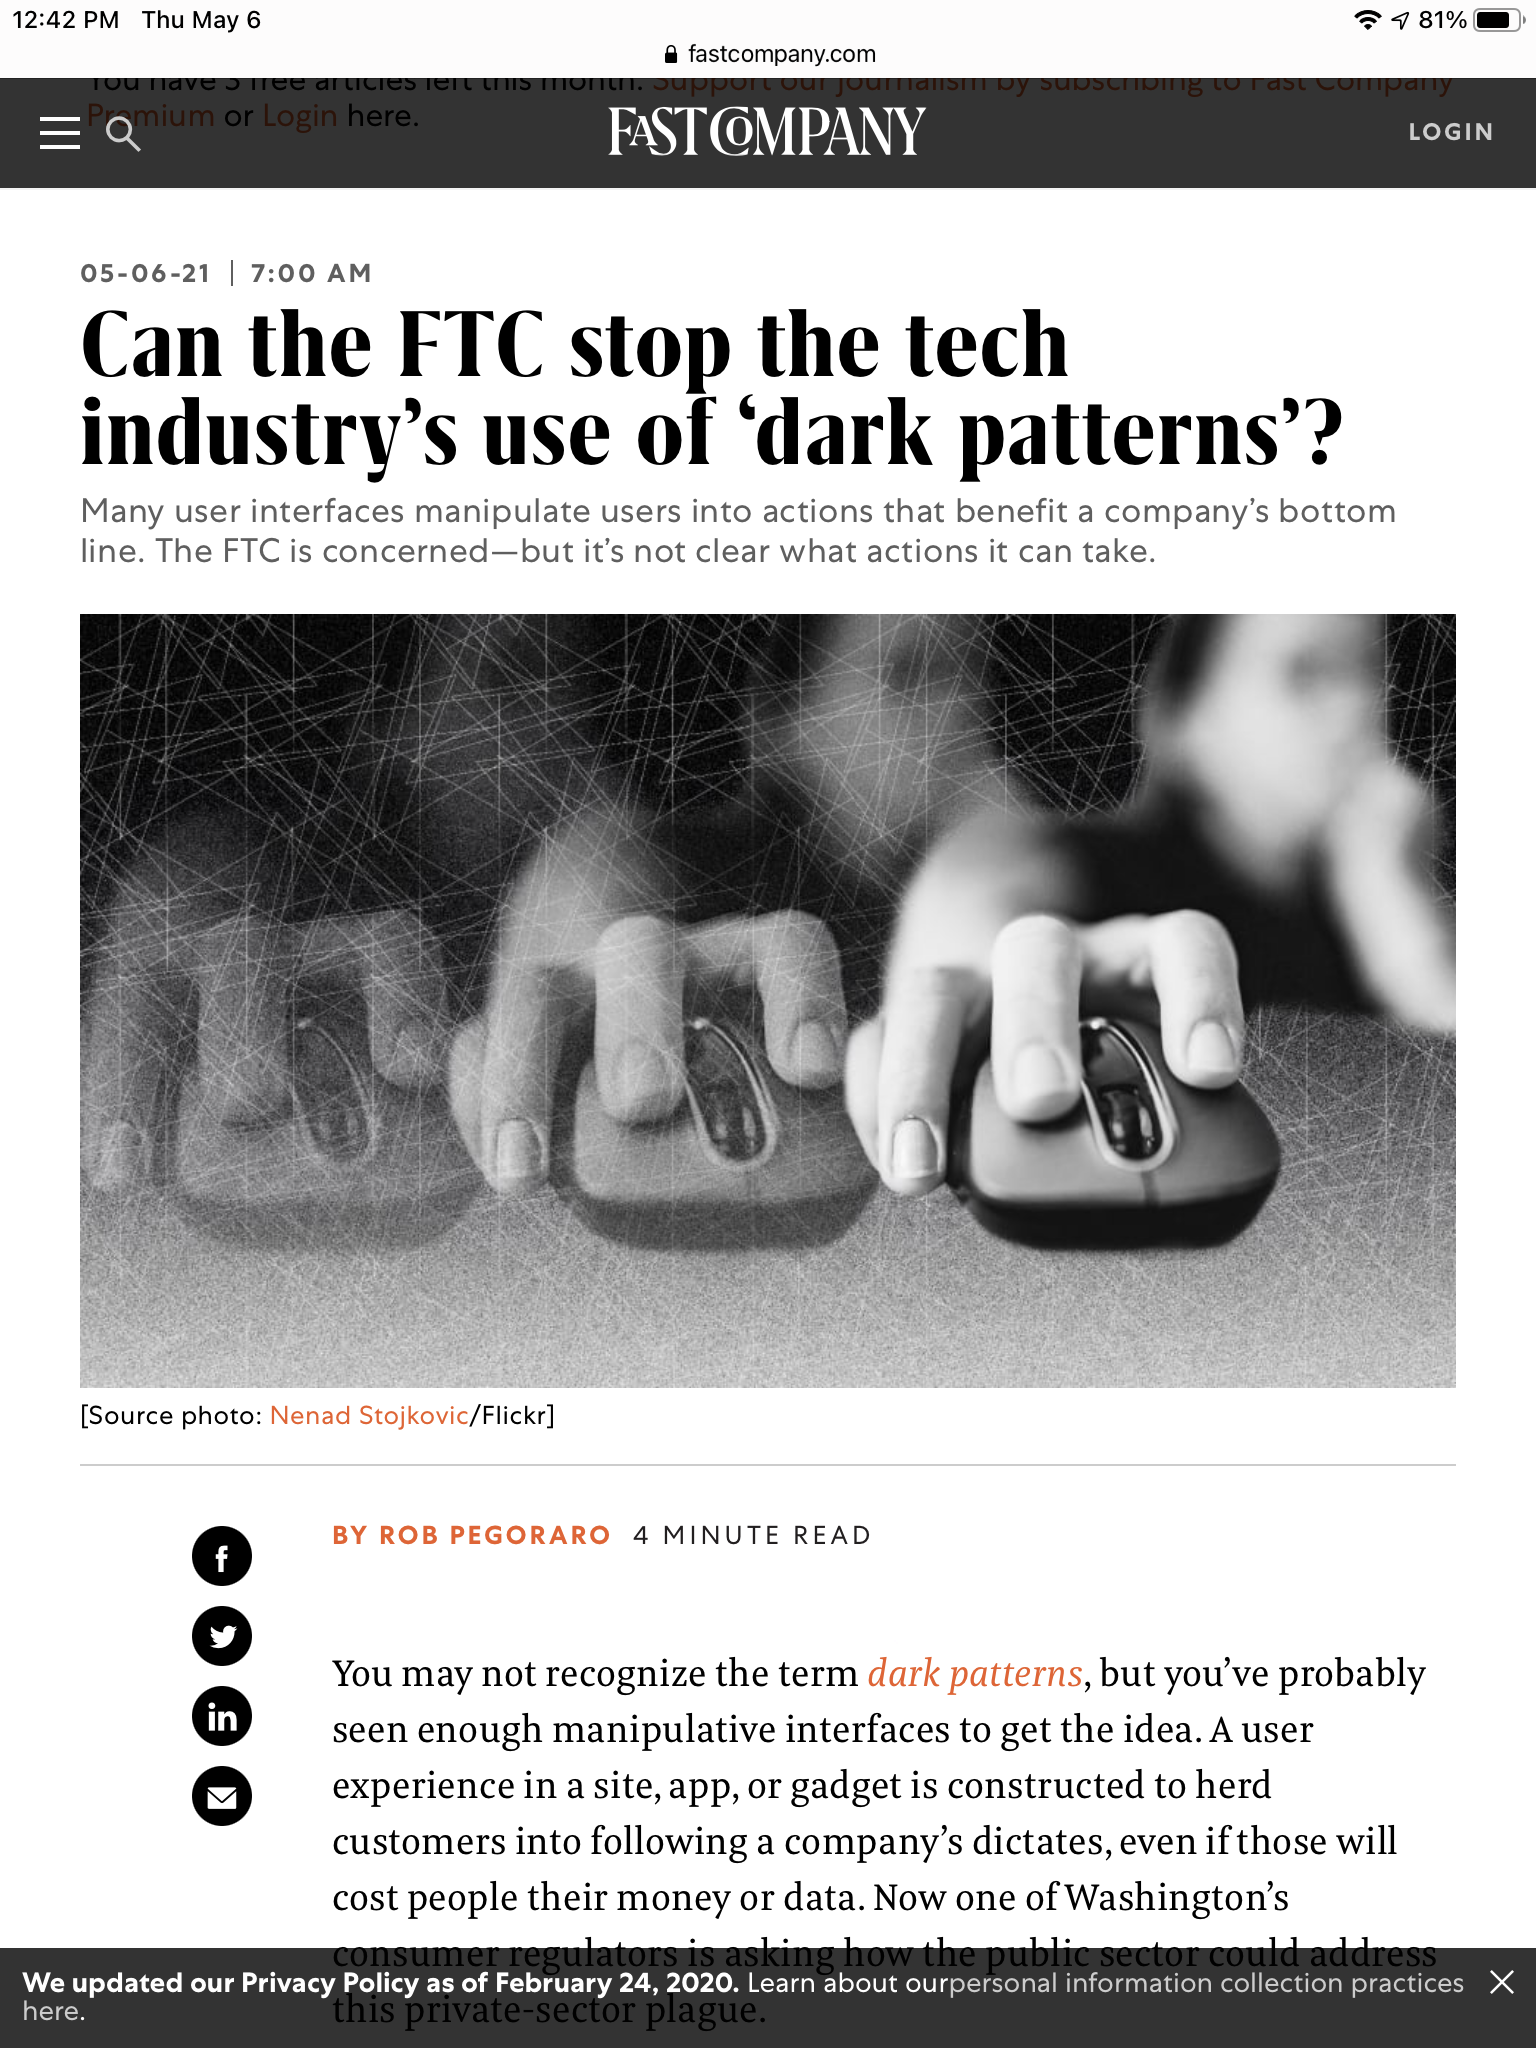 Fast Company FTC dark-patterns post